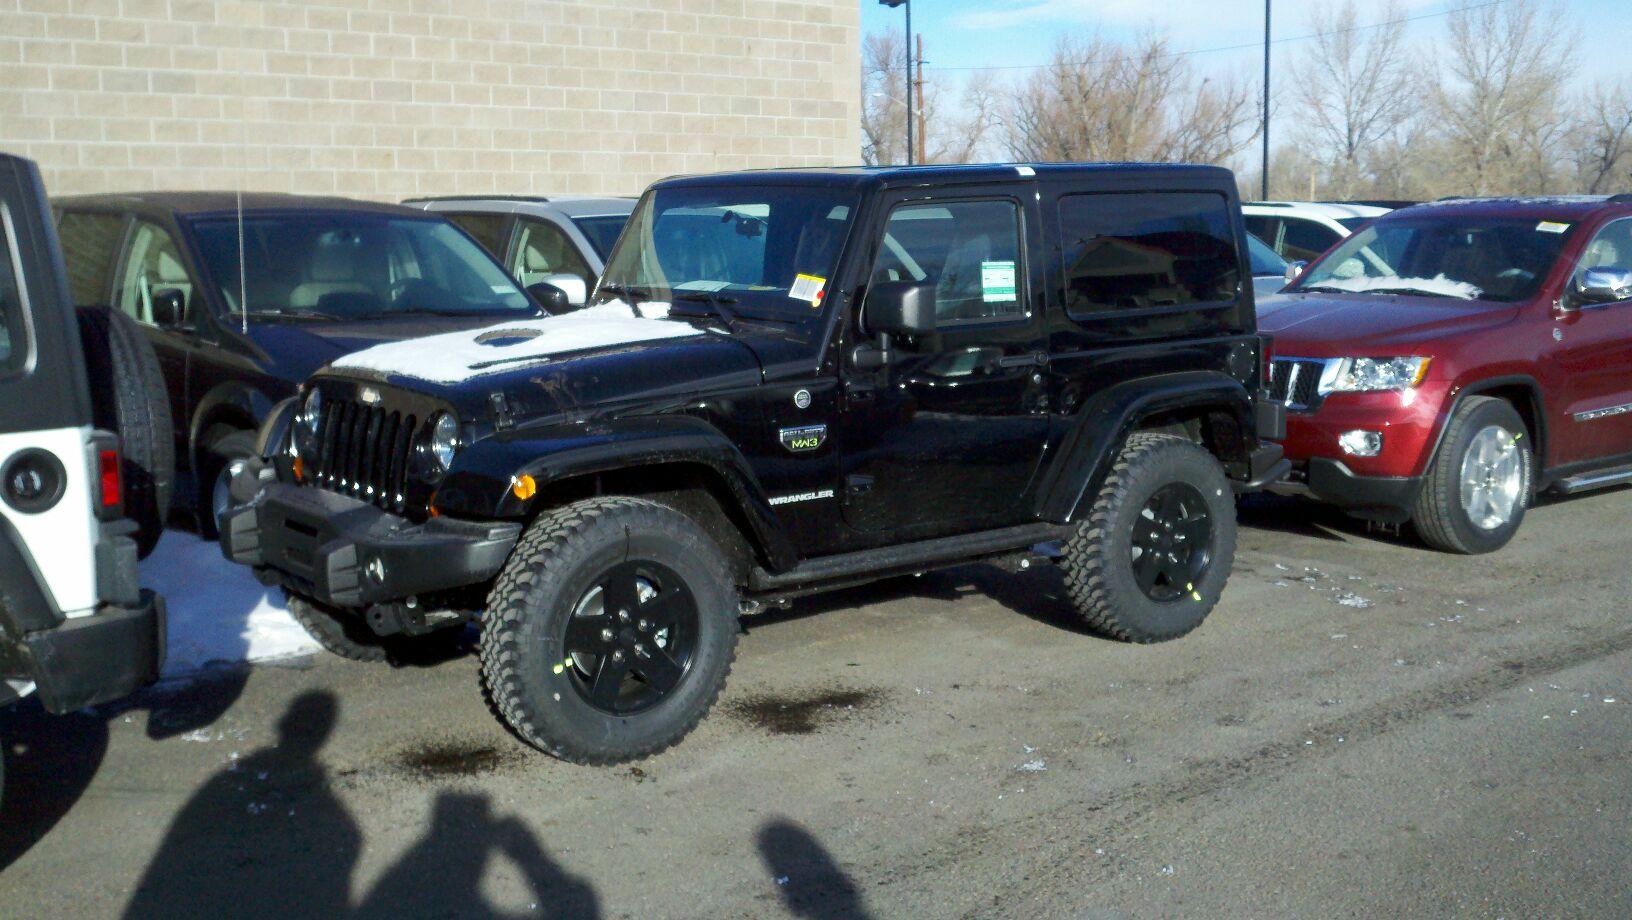 12 Call of Duty MW3 Sticker Shock  JKownerscom  Jeep Wrangler